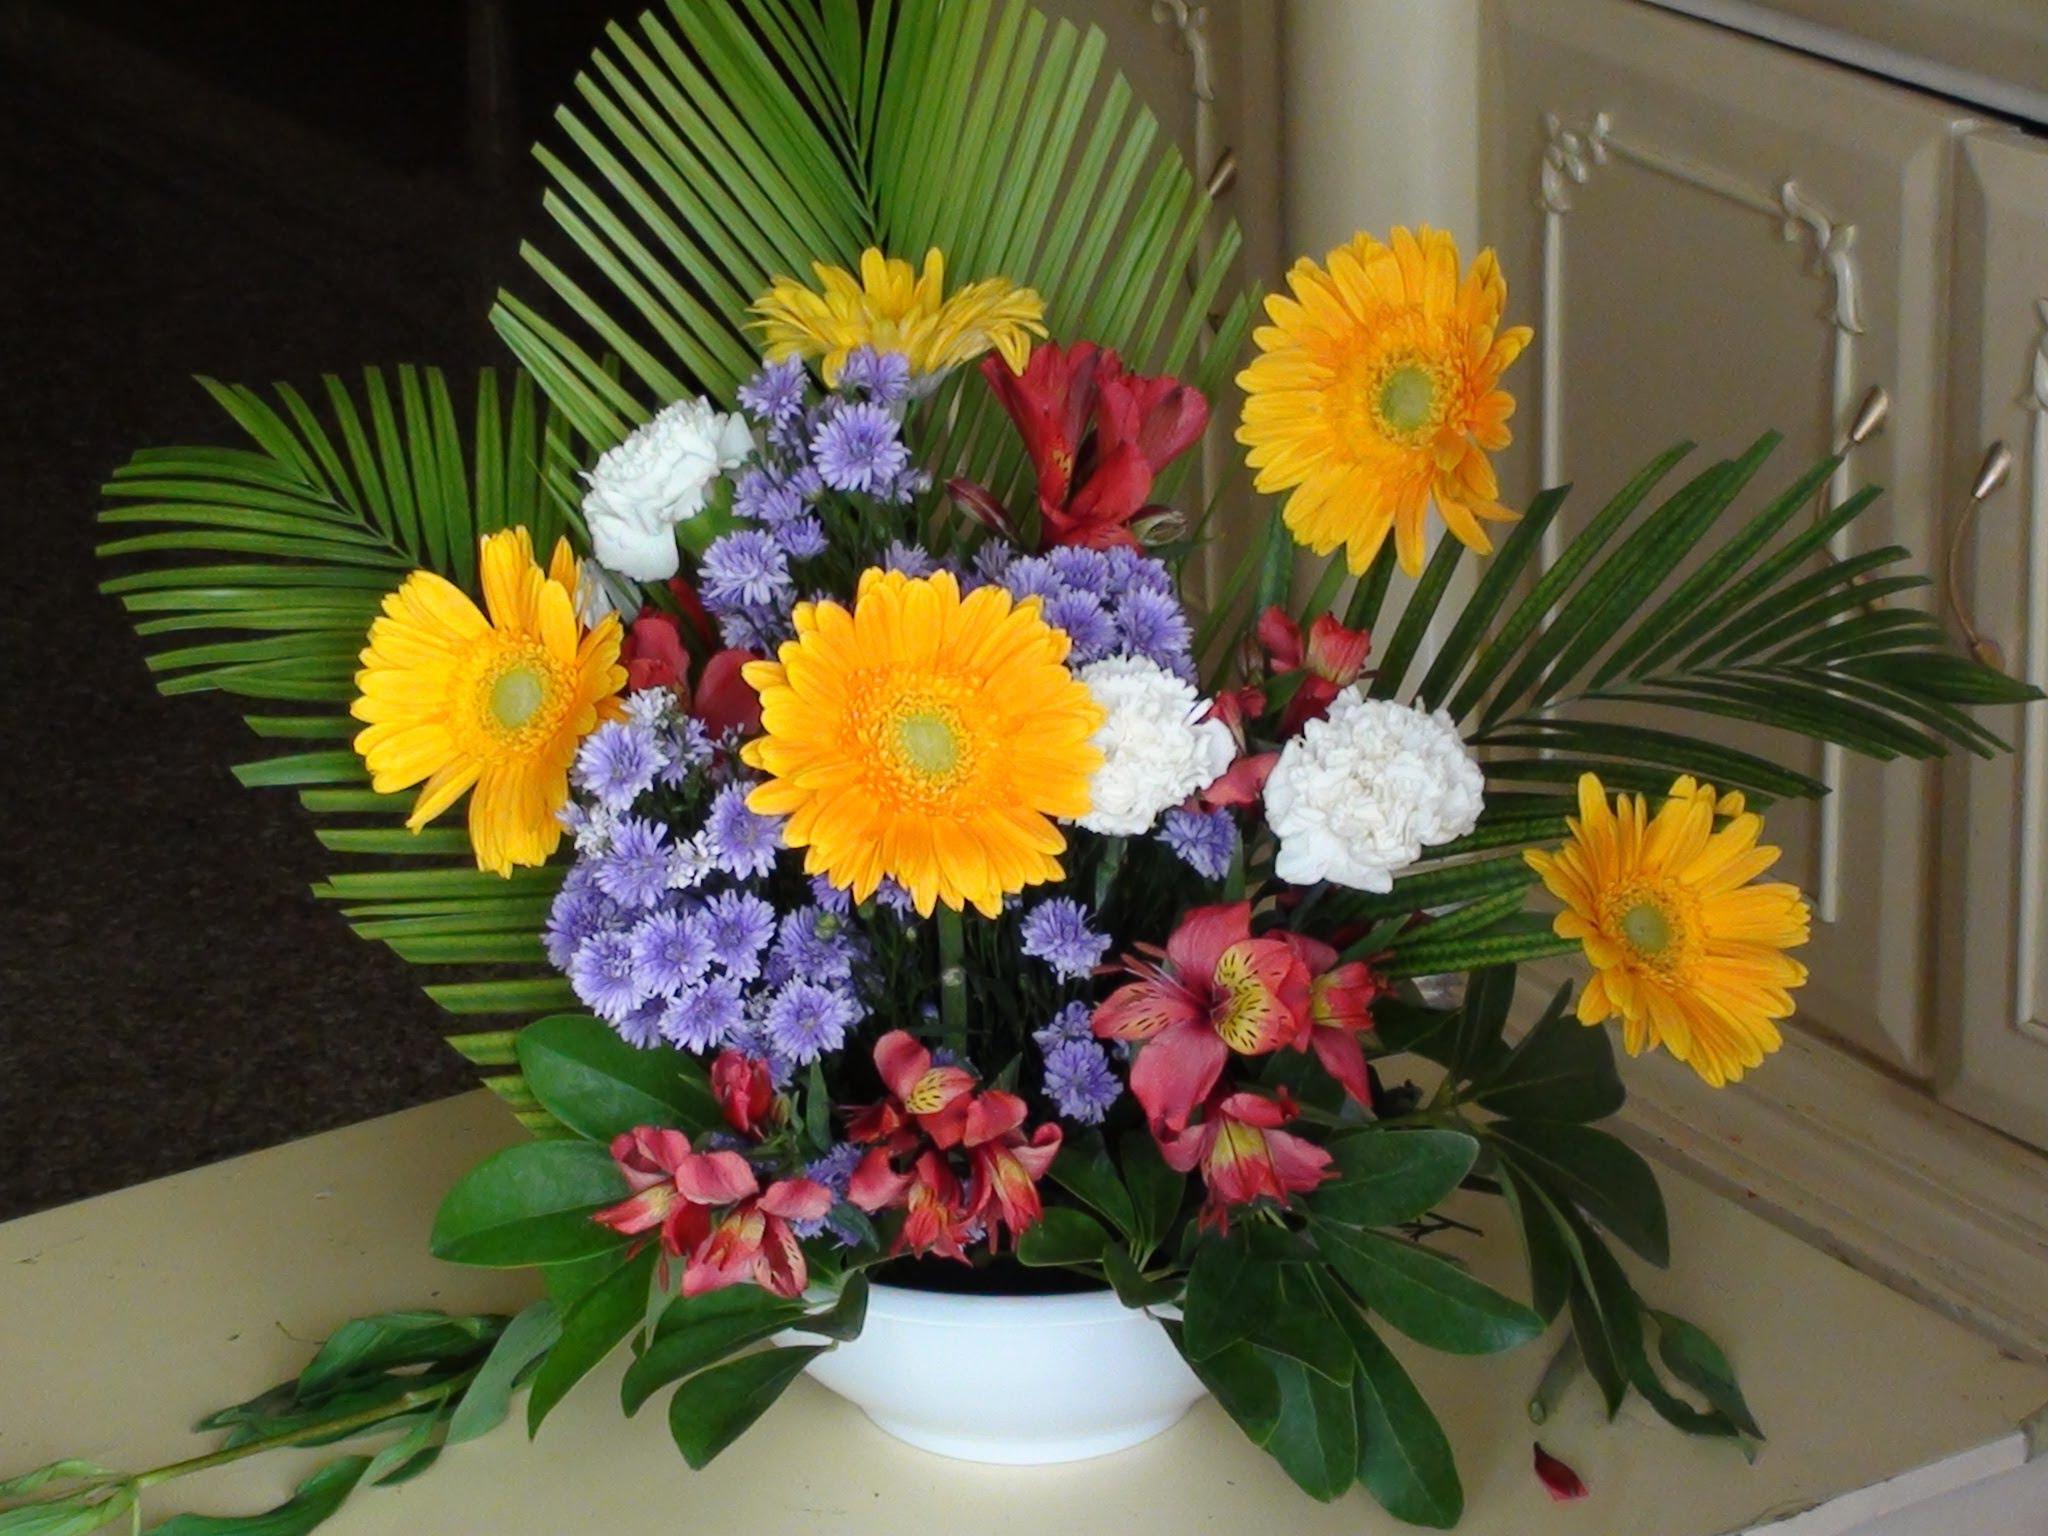 Flower Bouquet Wallpaper For Laptop